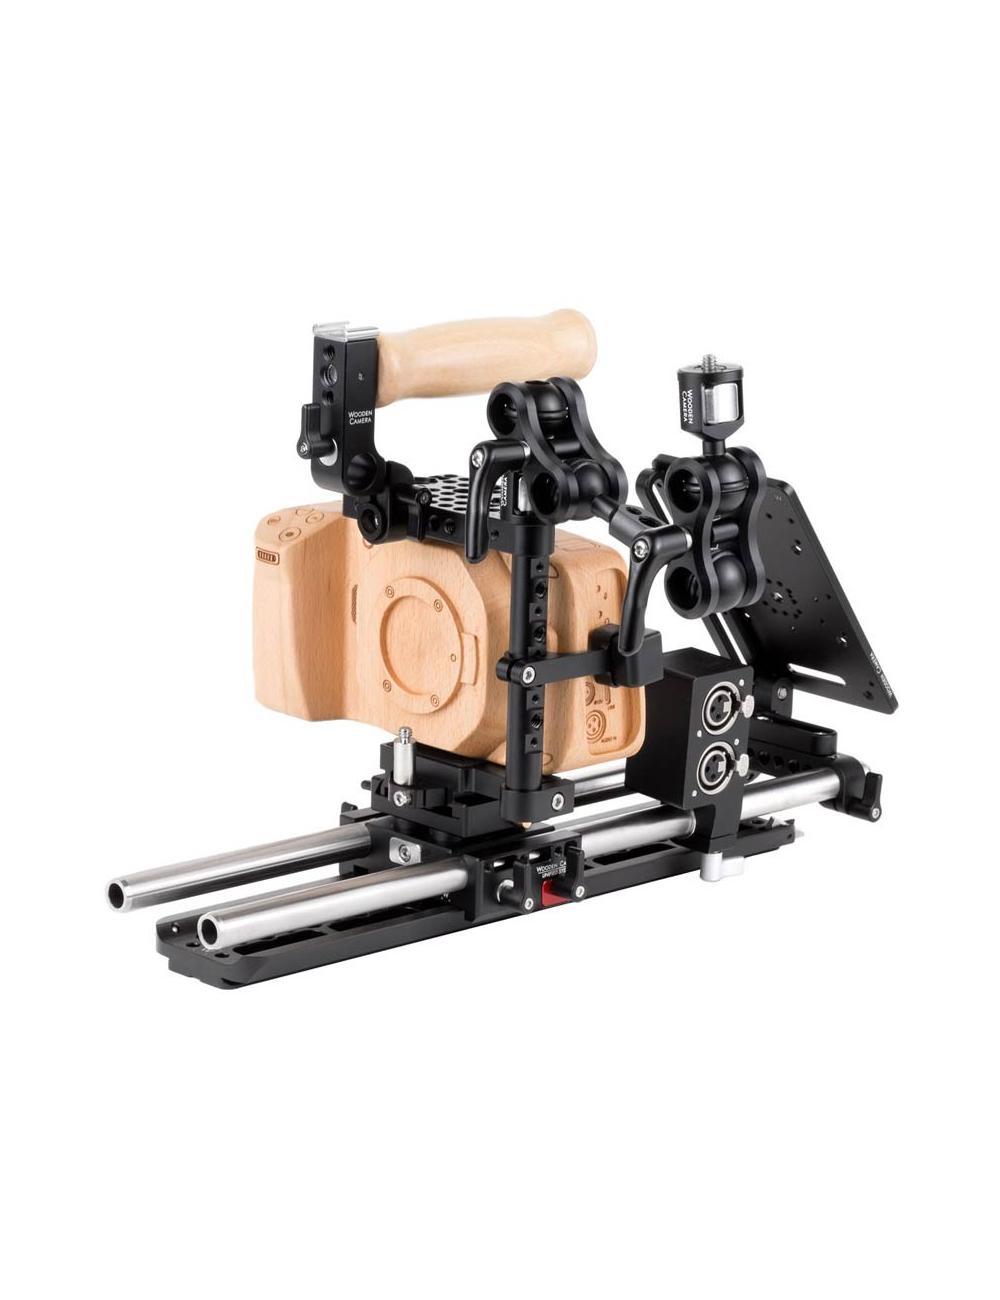 Wooden Camera Blackmagic Pocket Cinema Camera 4K Unified Accessory Kit (Pro)